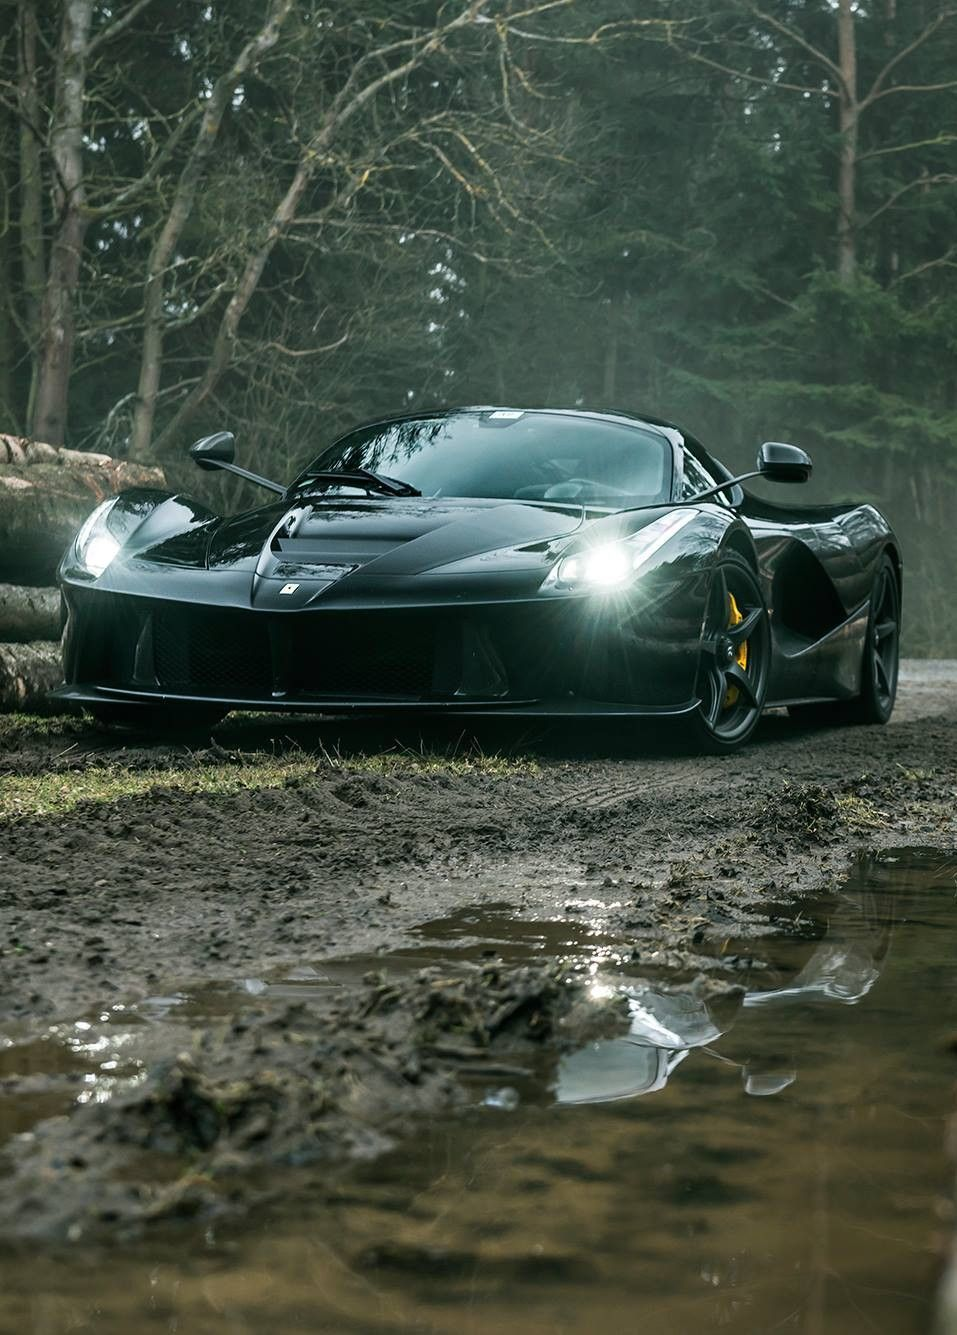 Ferrari Laferrari In The Mud Lease Yours With Premier Financial Pfs Simplelease Ferrari Laferrari Super Cars Amazing Cars